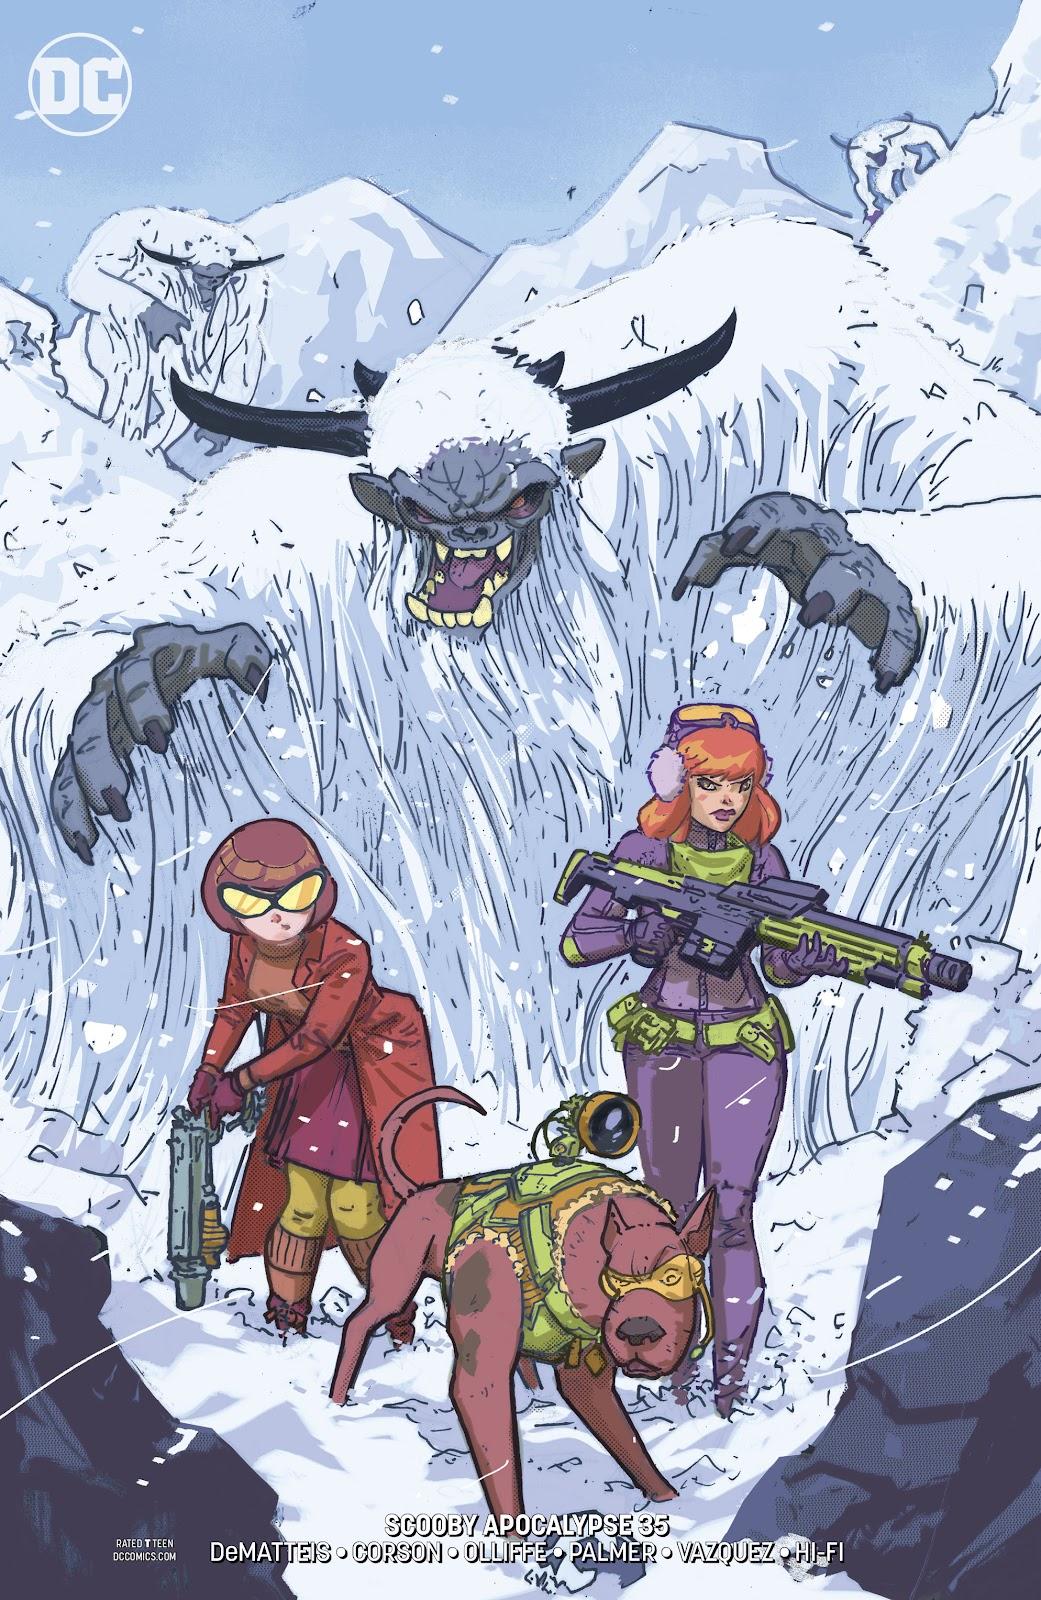 Read online Scooby Apocalypse comic -  Issue #35 - 3